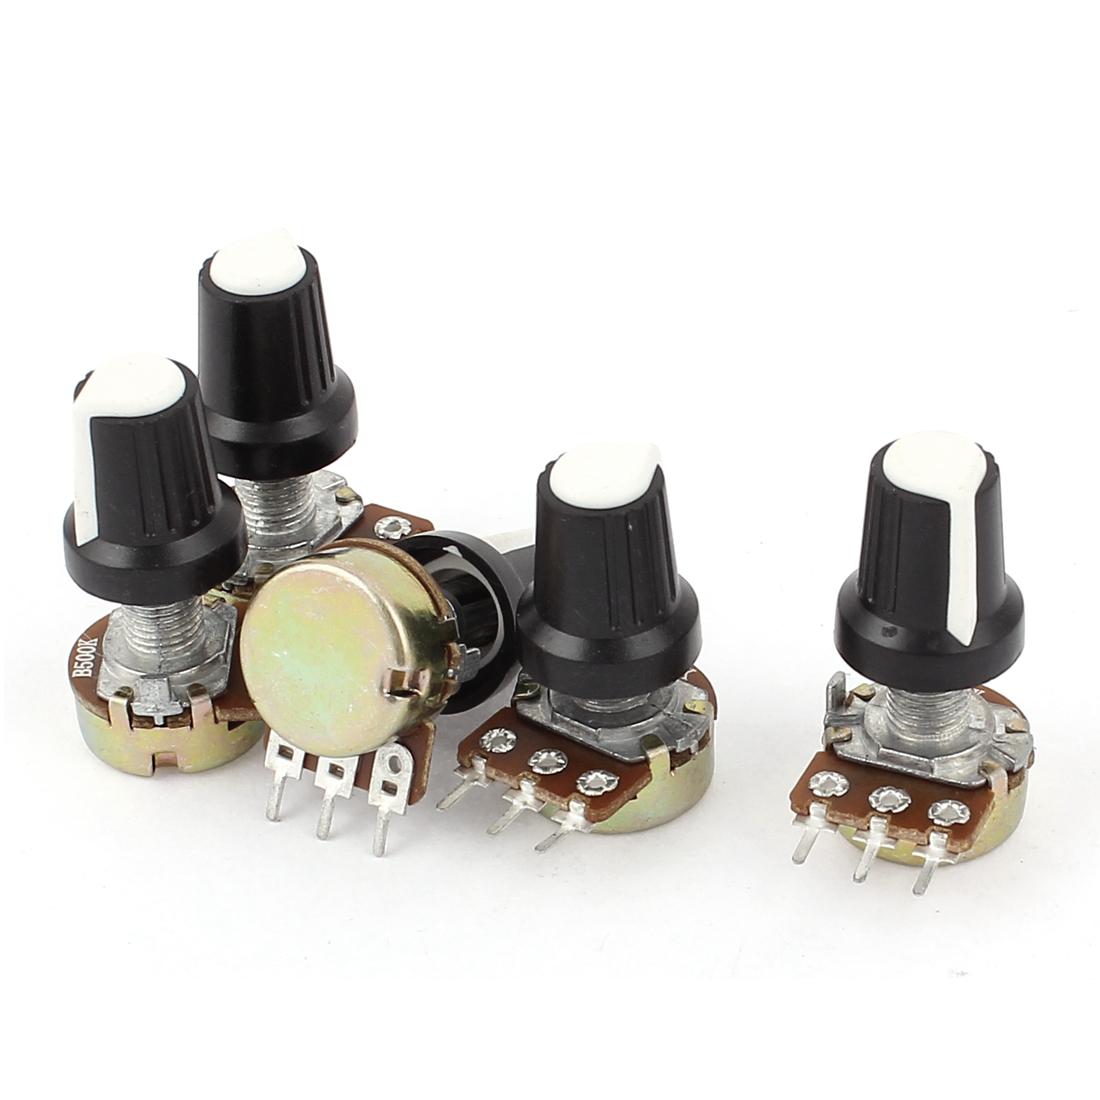 New 5pcs 500K OHM 3 Terminal Linear Taper Rotary Volume B Type Potentiometer Pot